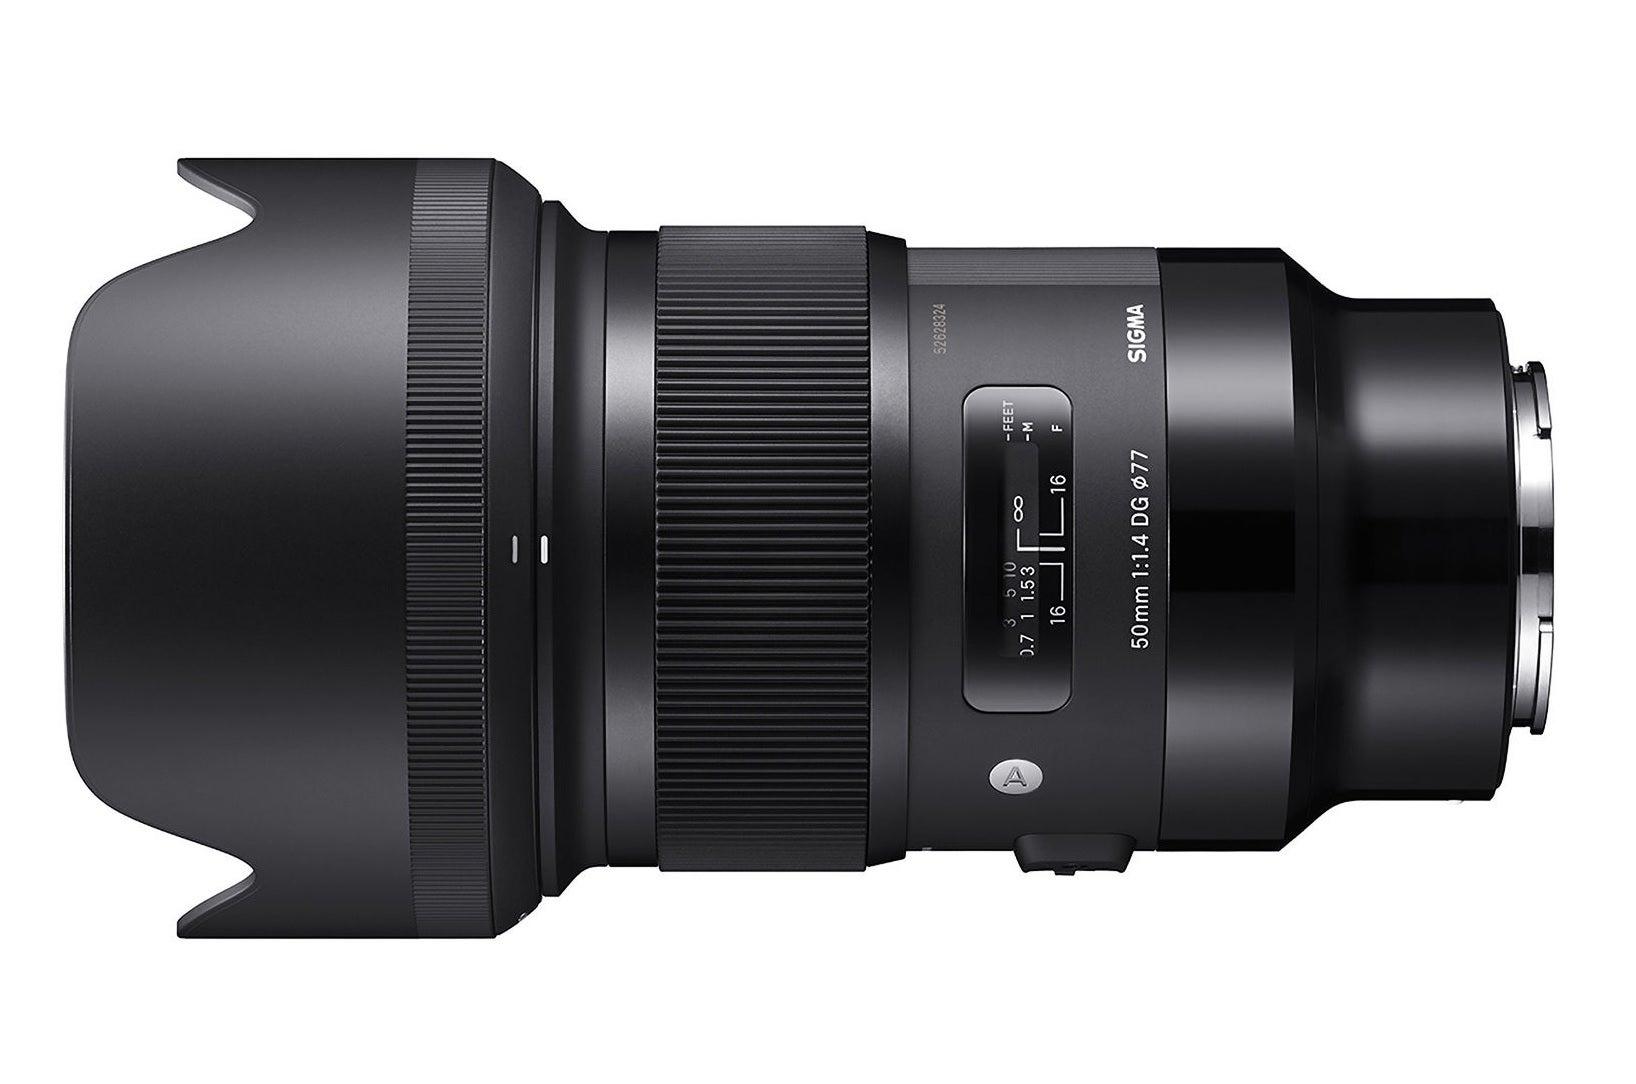 Sigma 50mm F1.4 DG HSM Lens